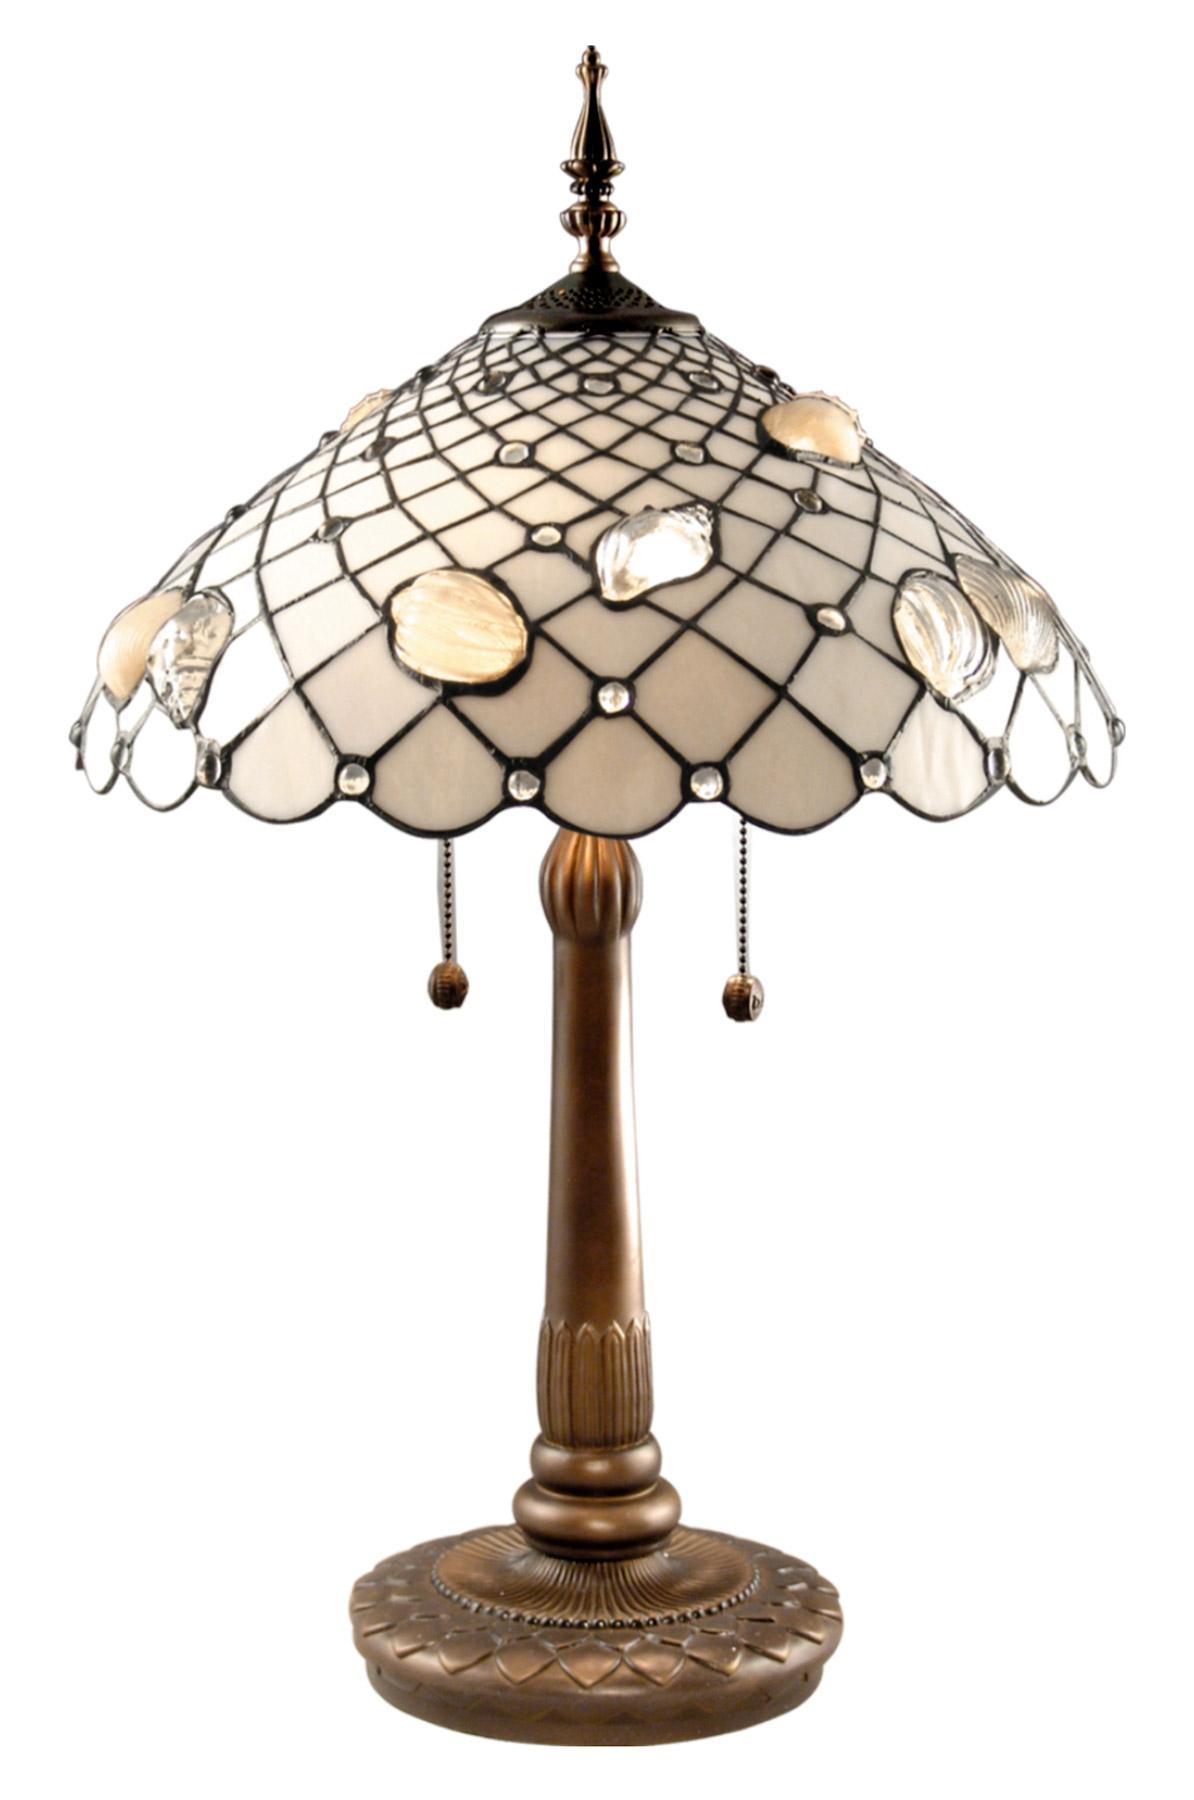 Dale Tiffany Tt60055 Tiffany Shells Table Lamp